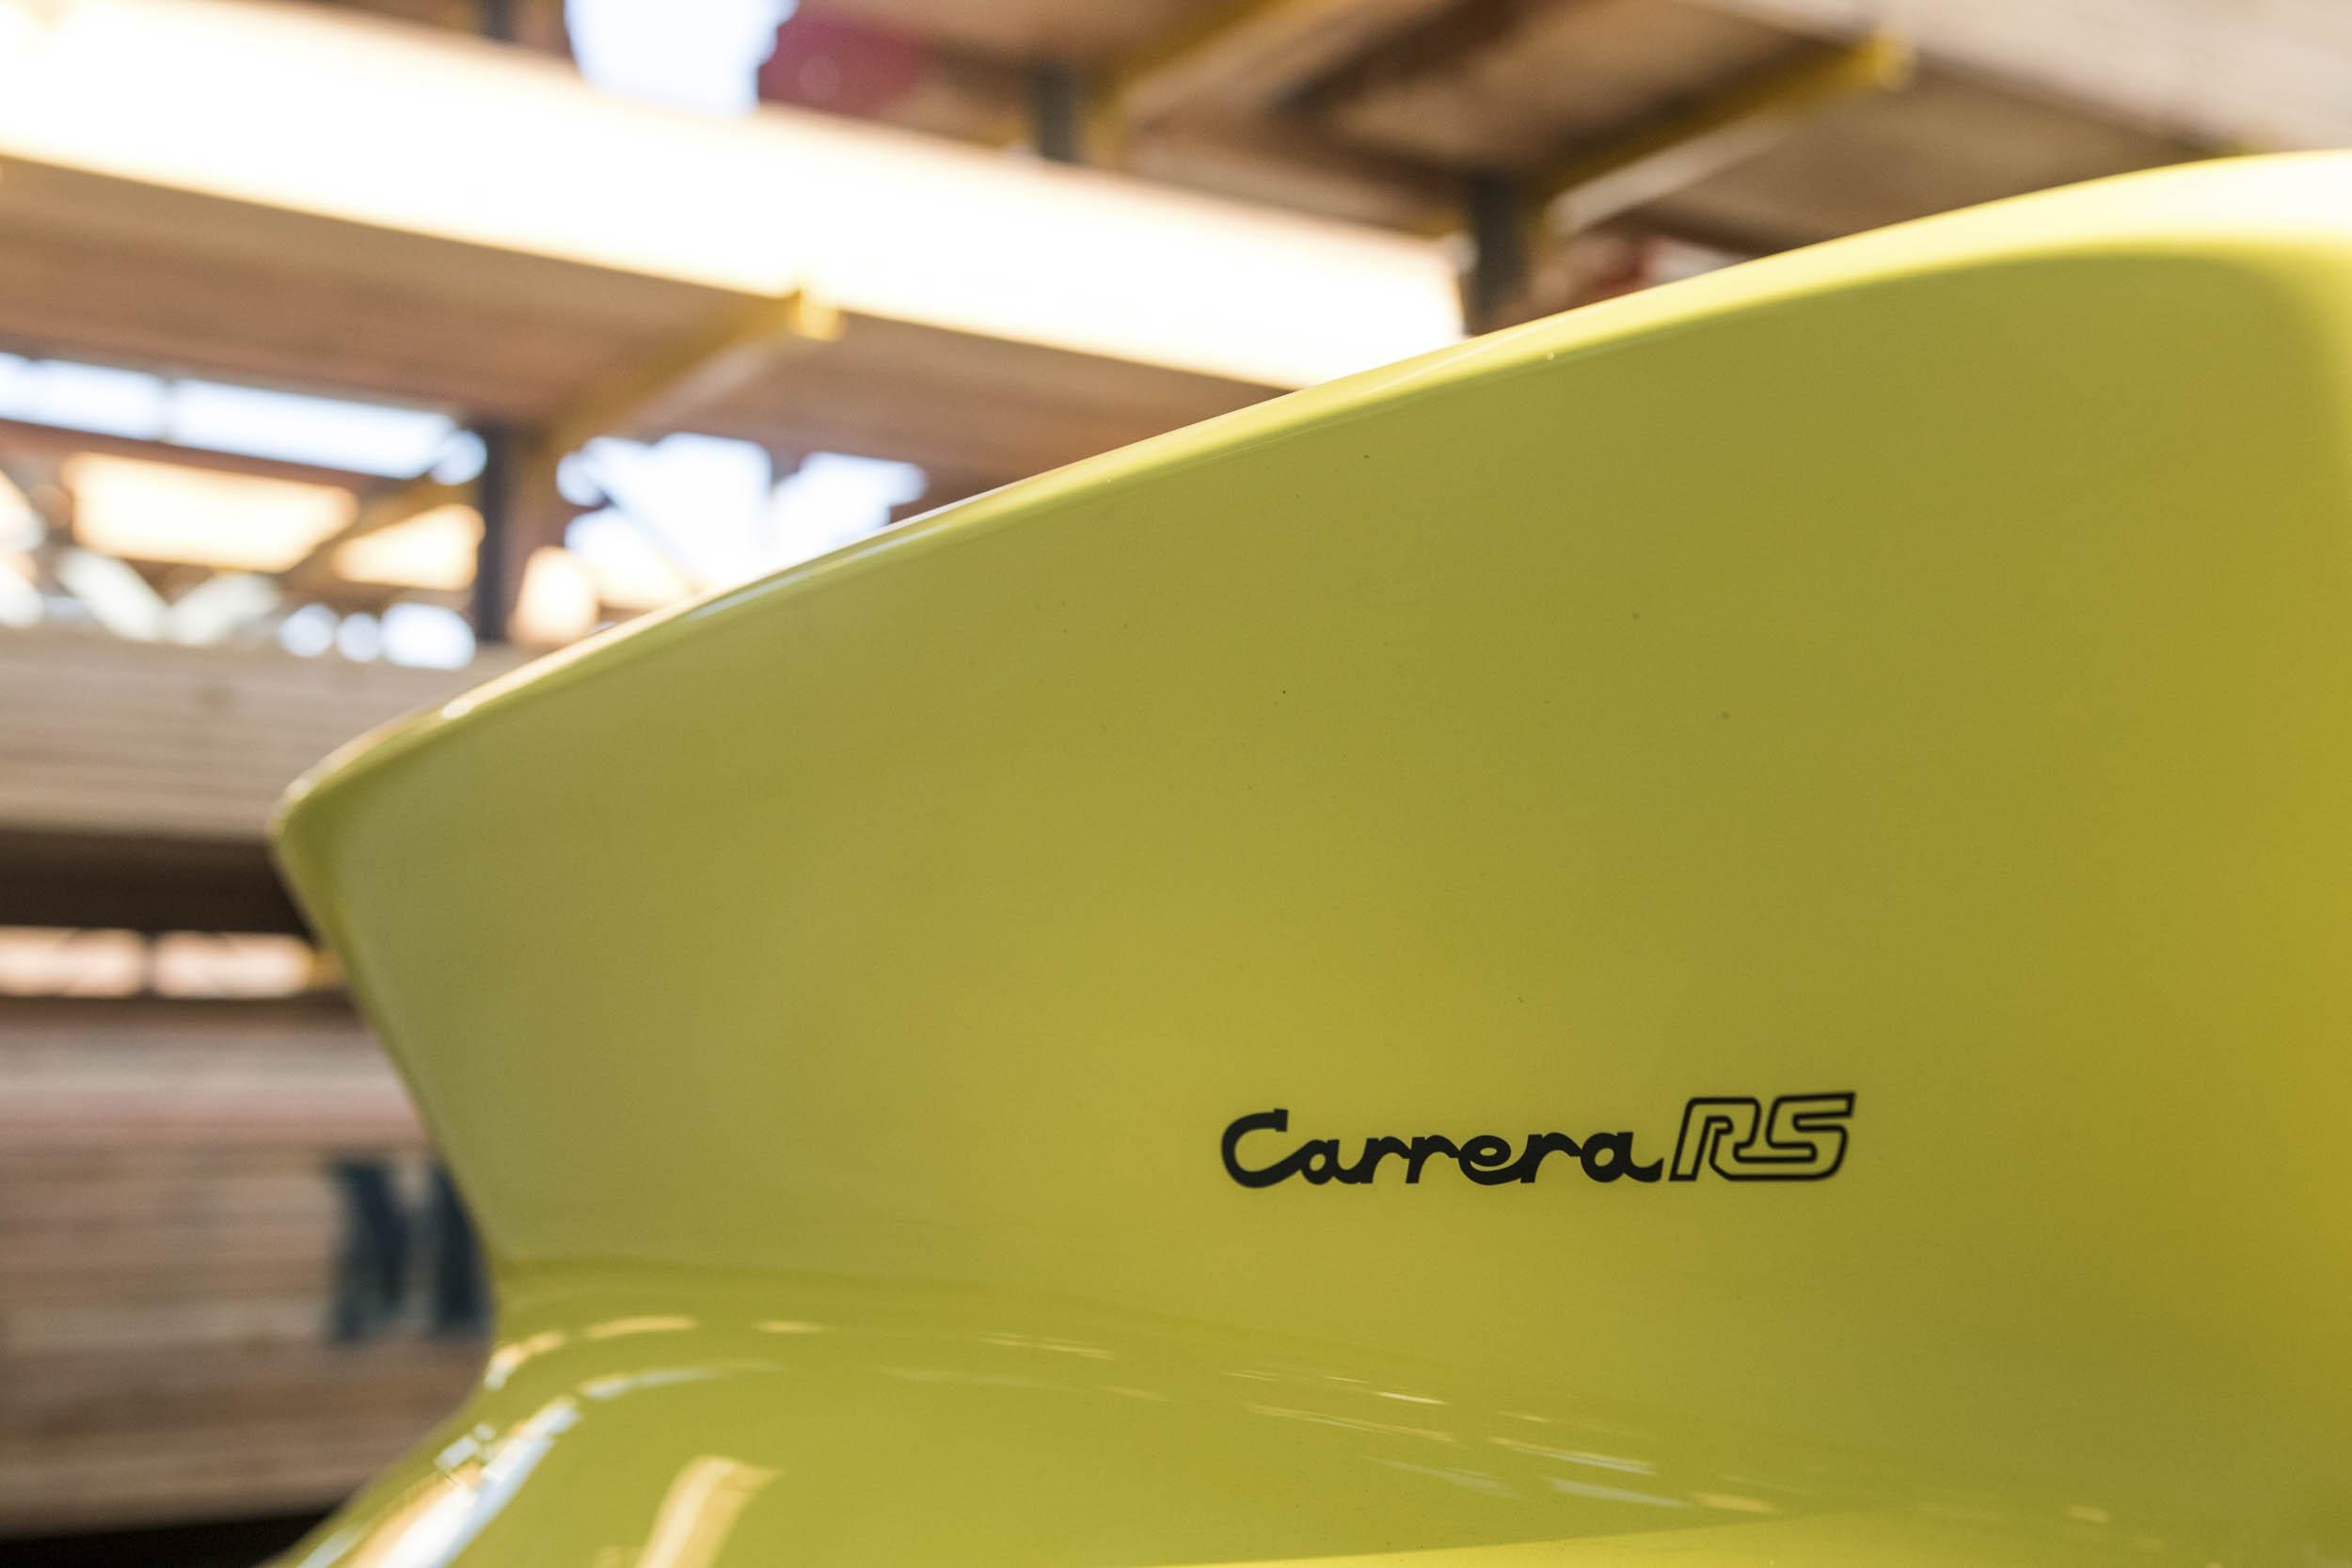 Porsche Carrera RS Badge detail Luftgekühlt